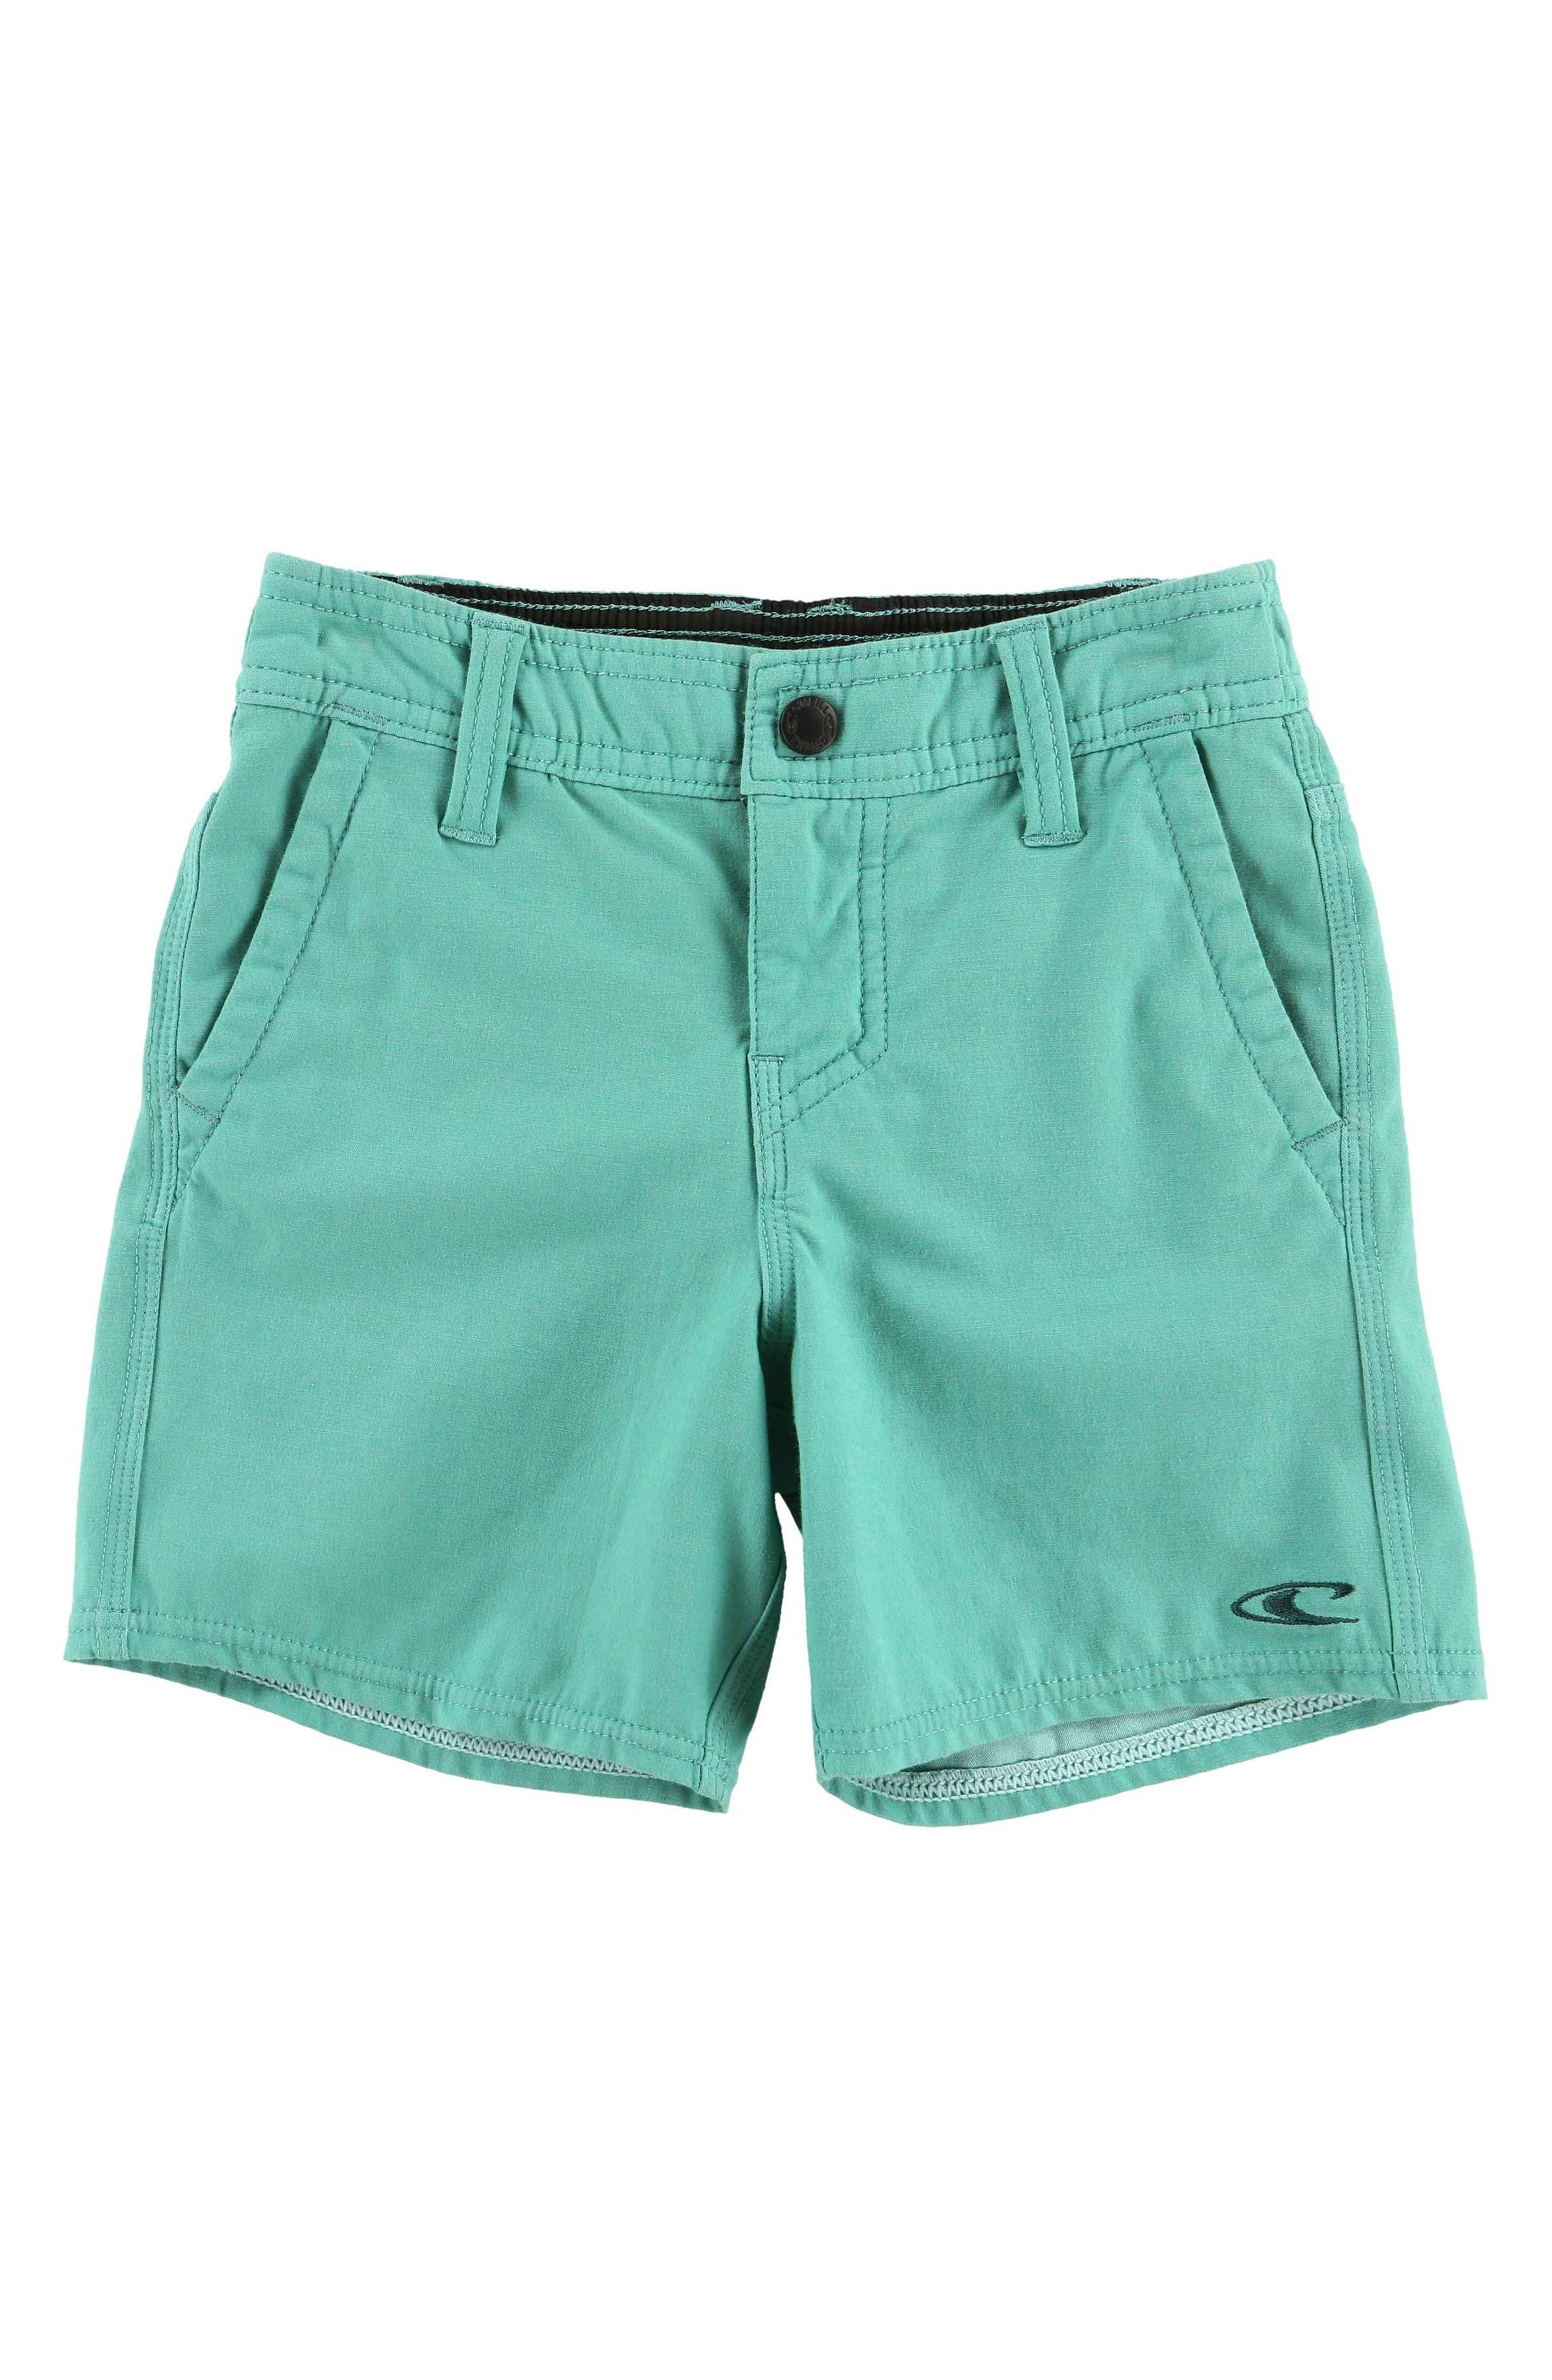 Main Image - O'Neill Locked Hybrid Board Shorts (Little Boys)